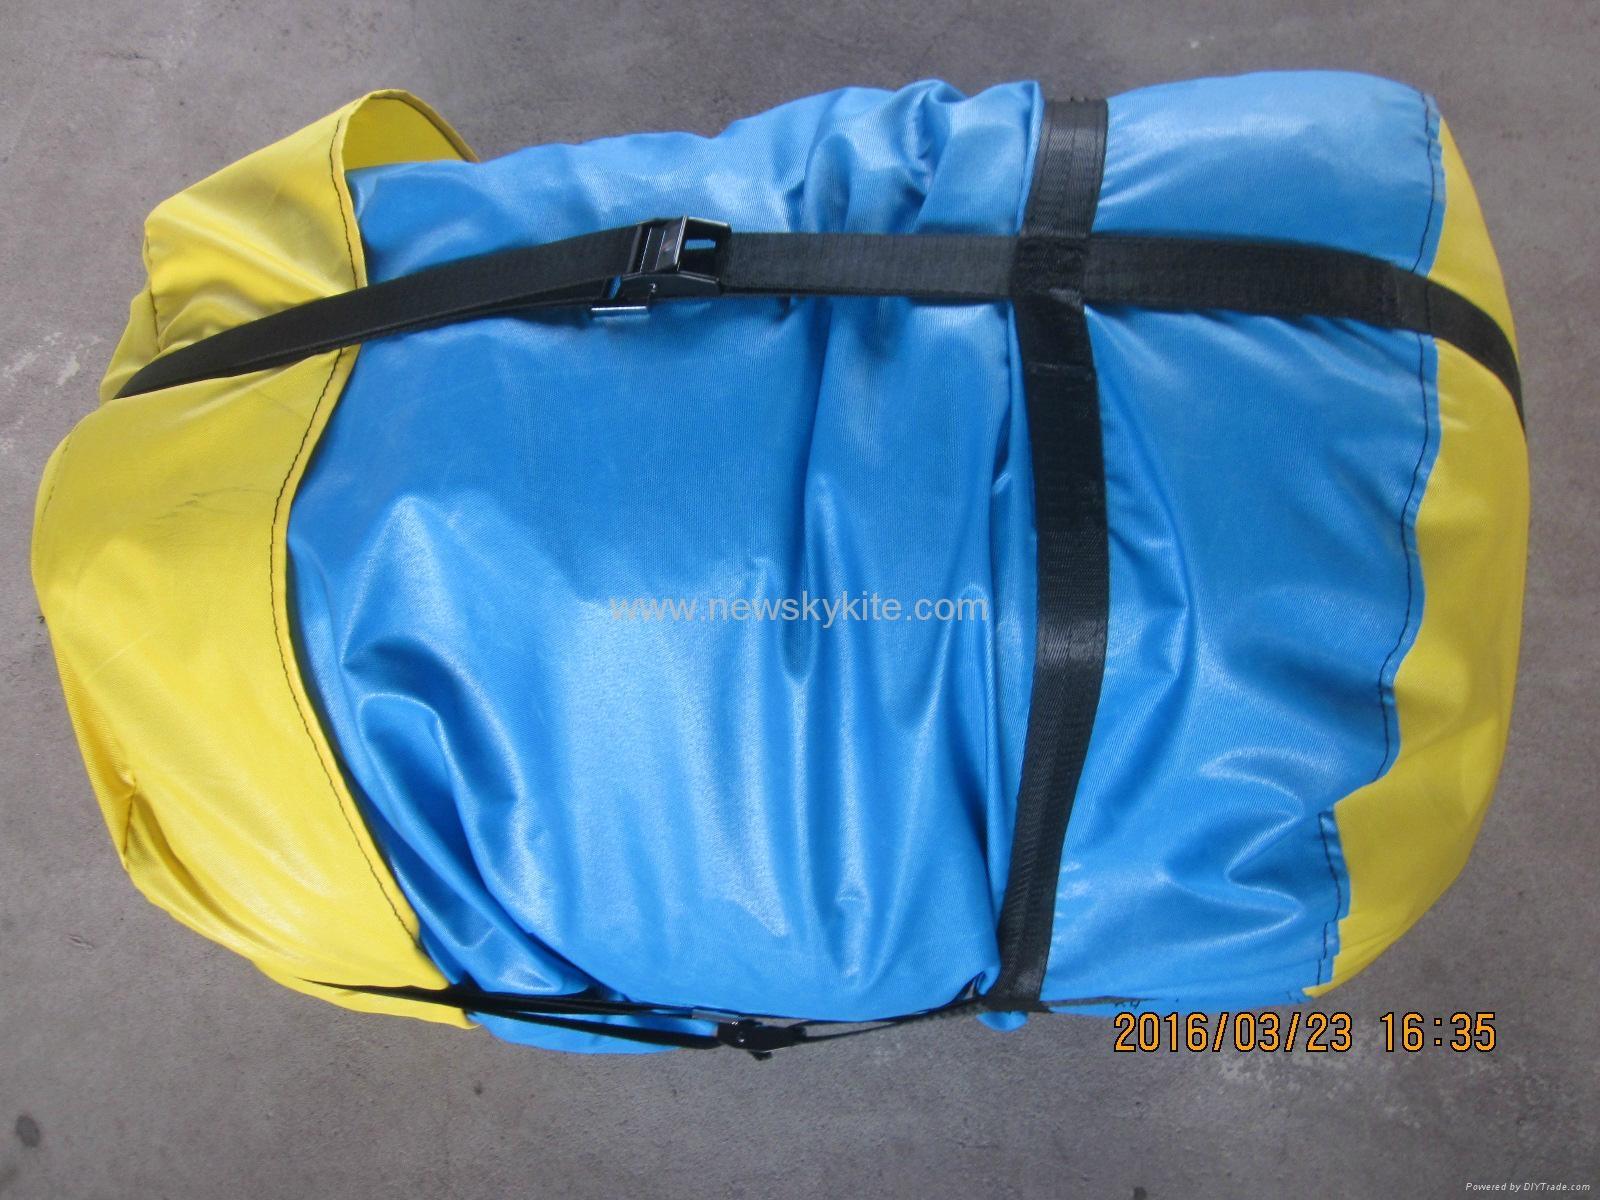 9069 Compression bag